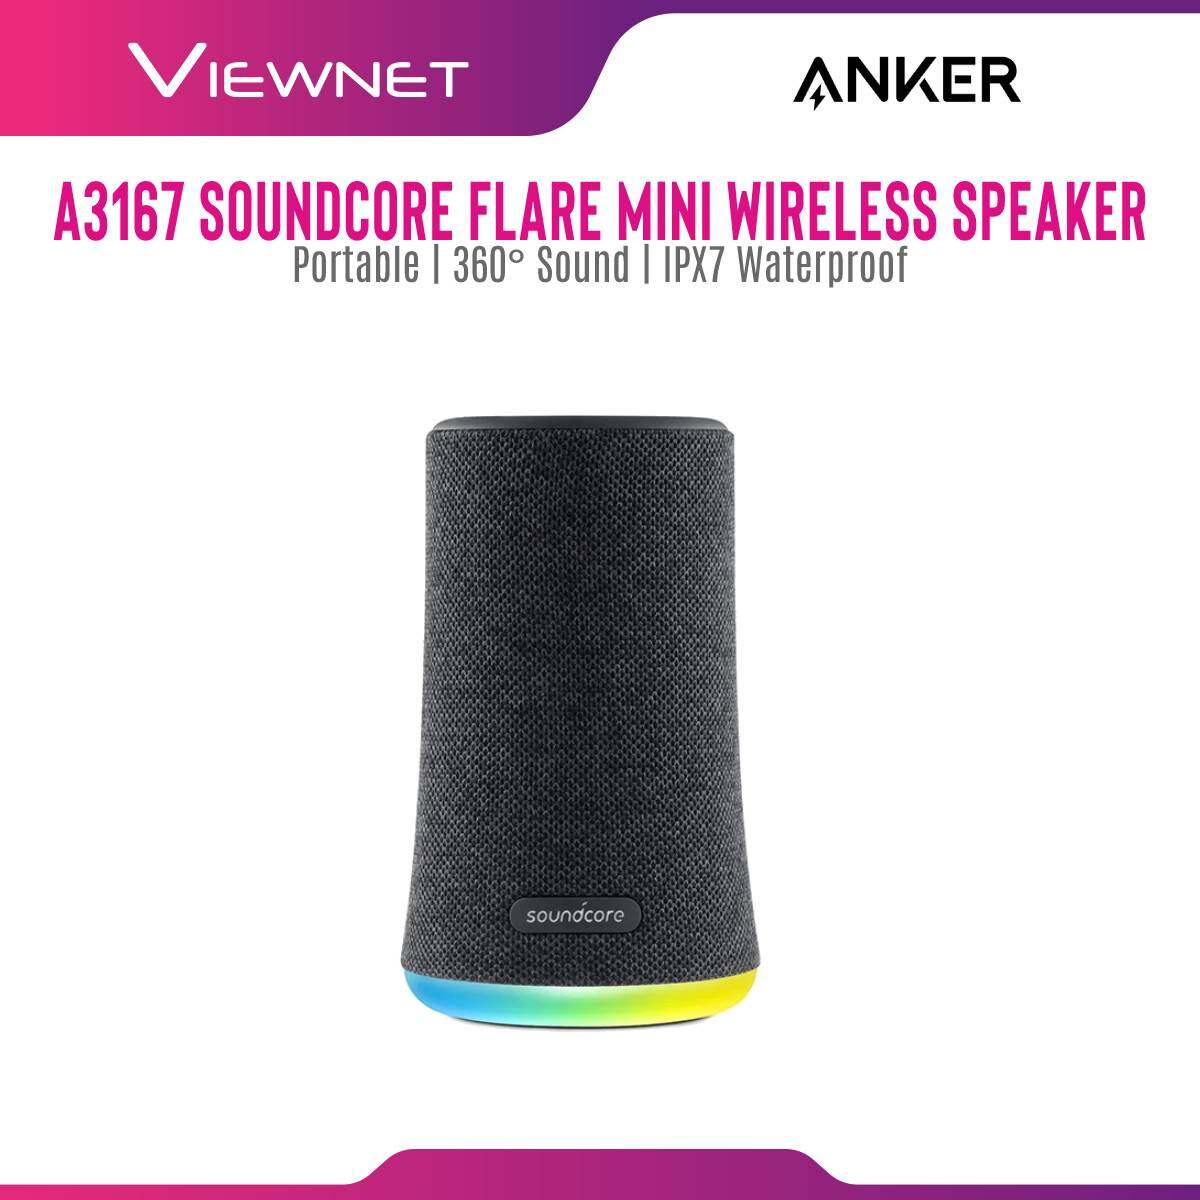 Anker A3167 Soundcore Flame Mini Portable Wireless Speaker